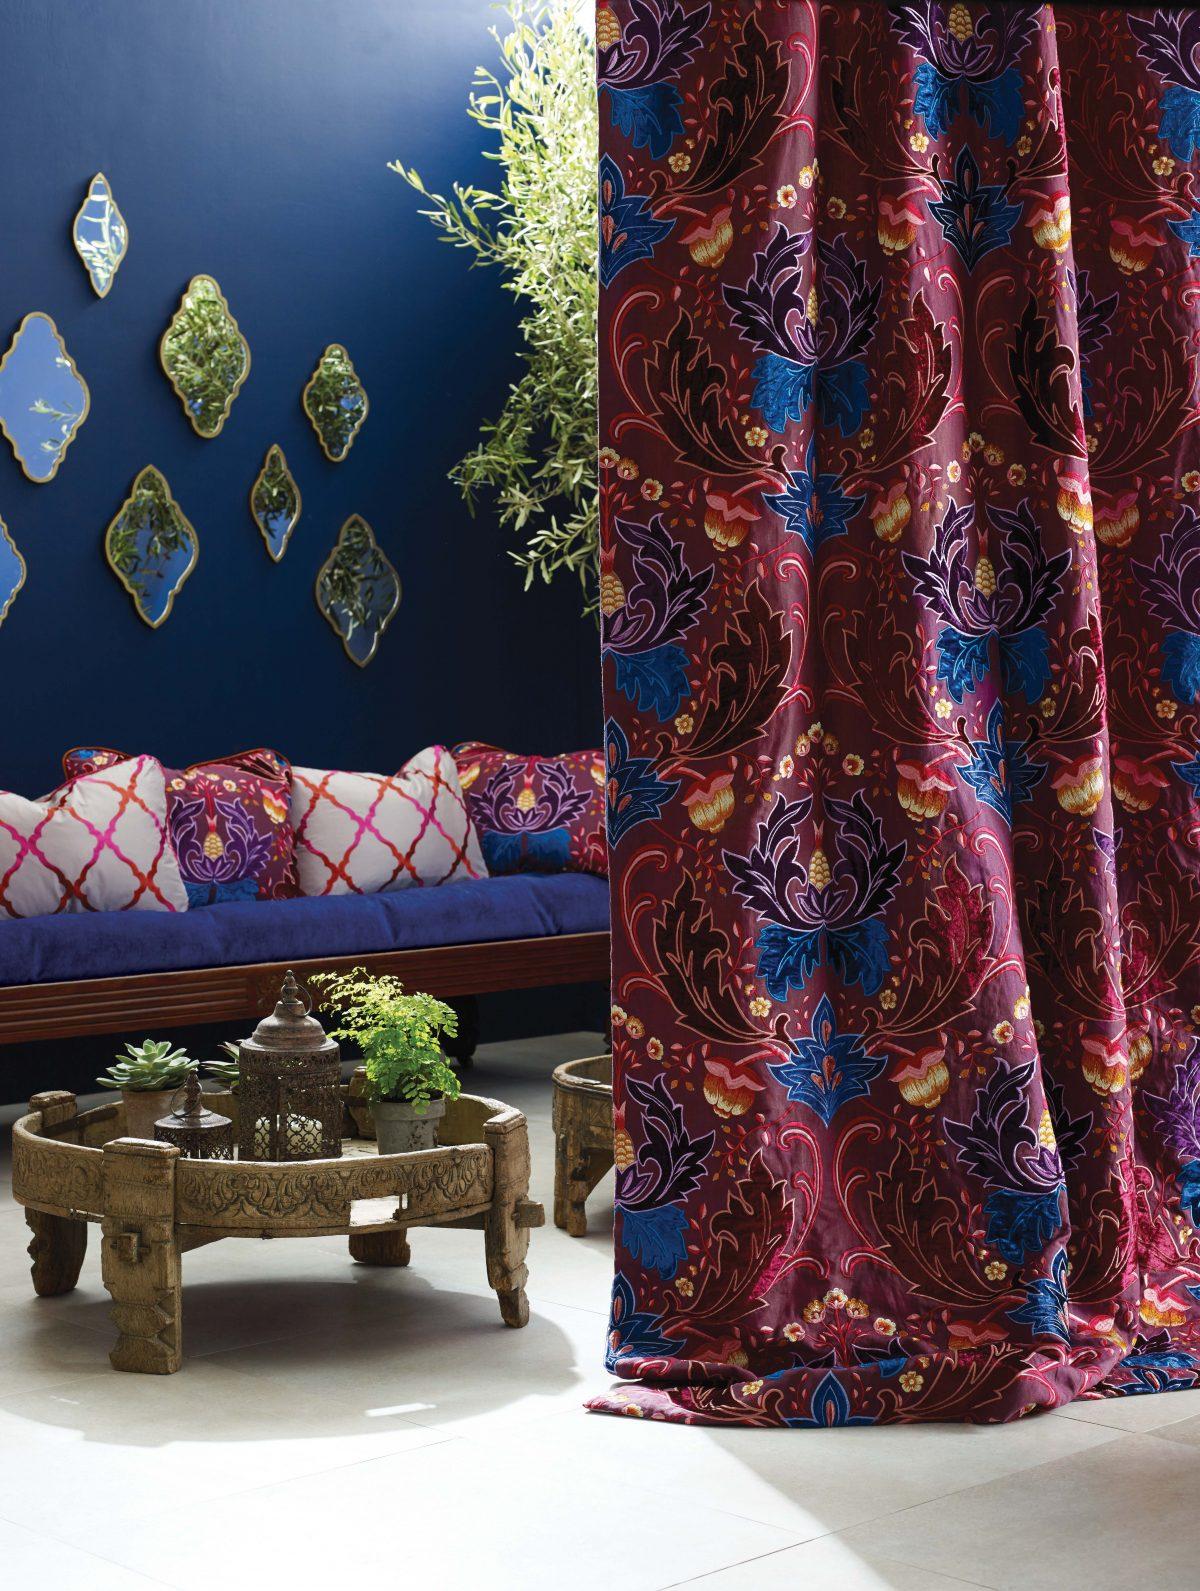 Matthew Williamson Durbar Curtains from Fabric Gallery & Interiors